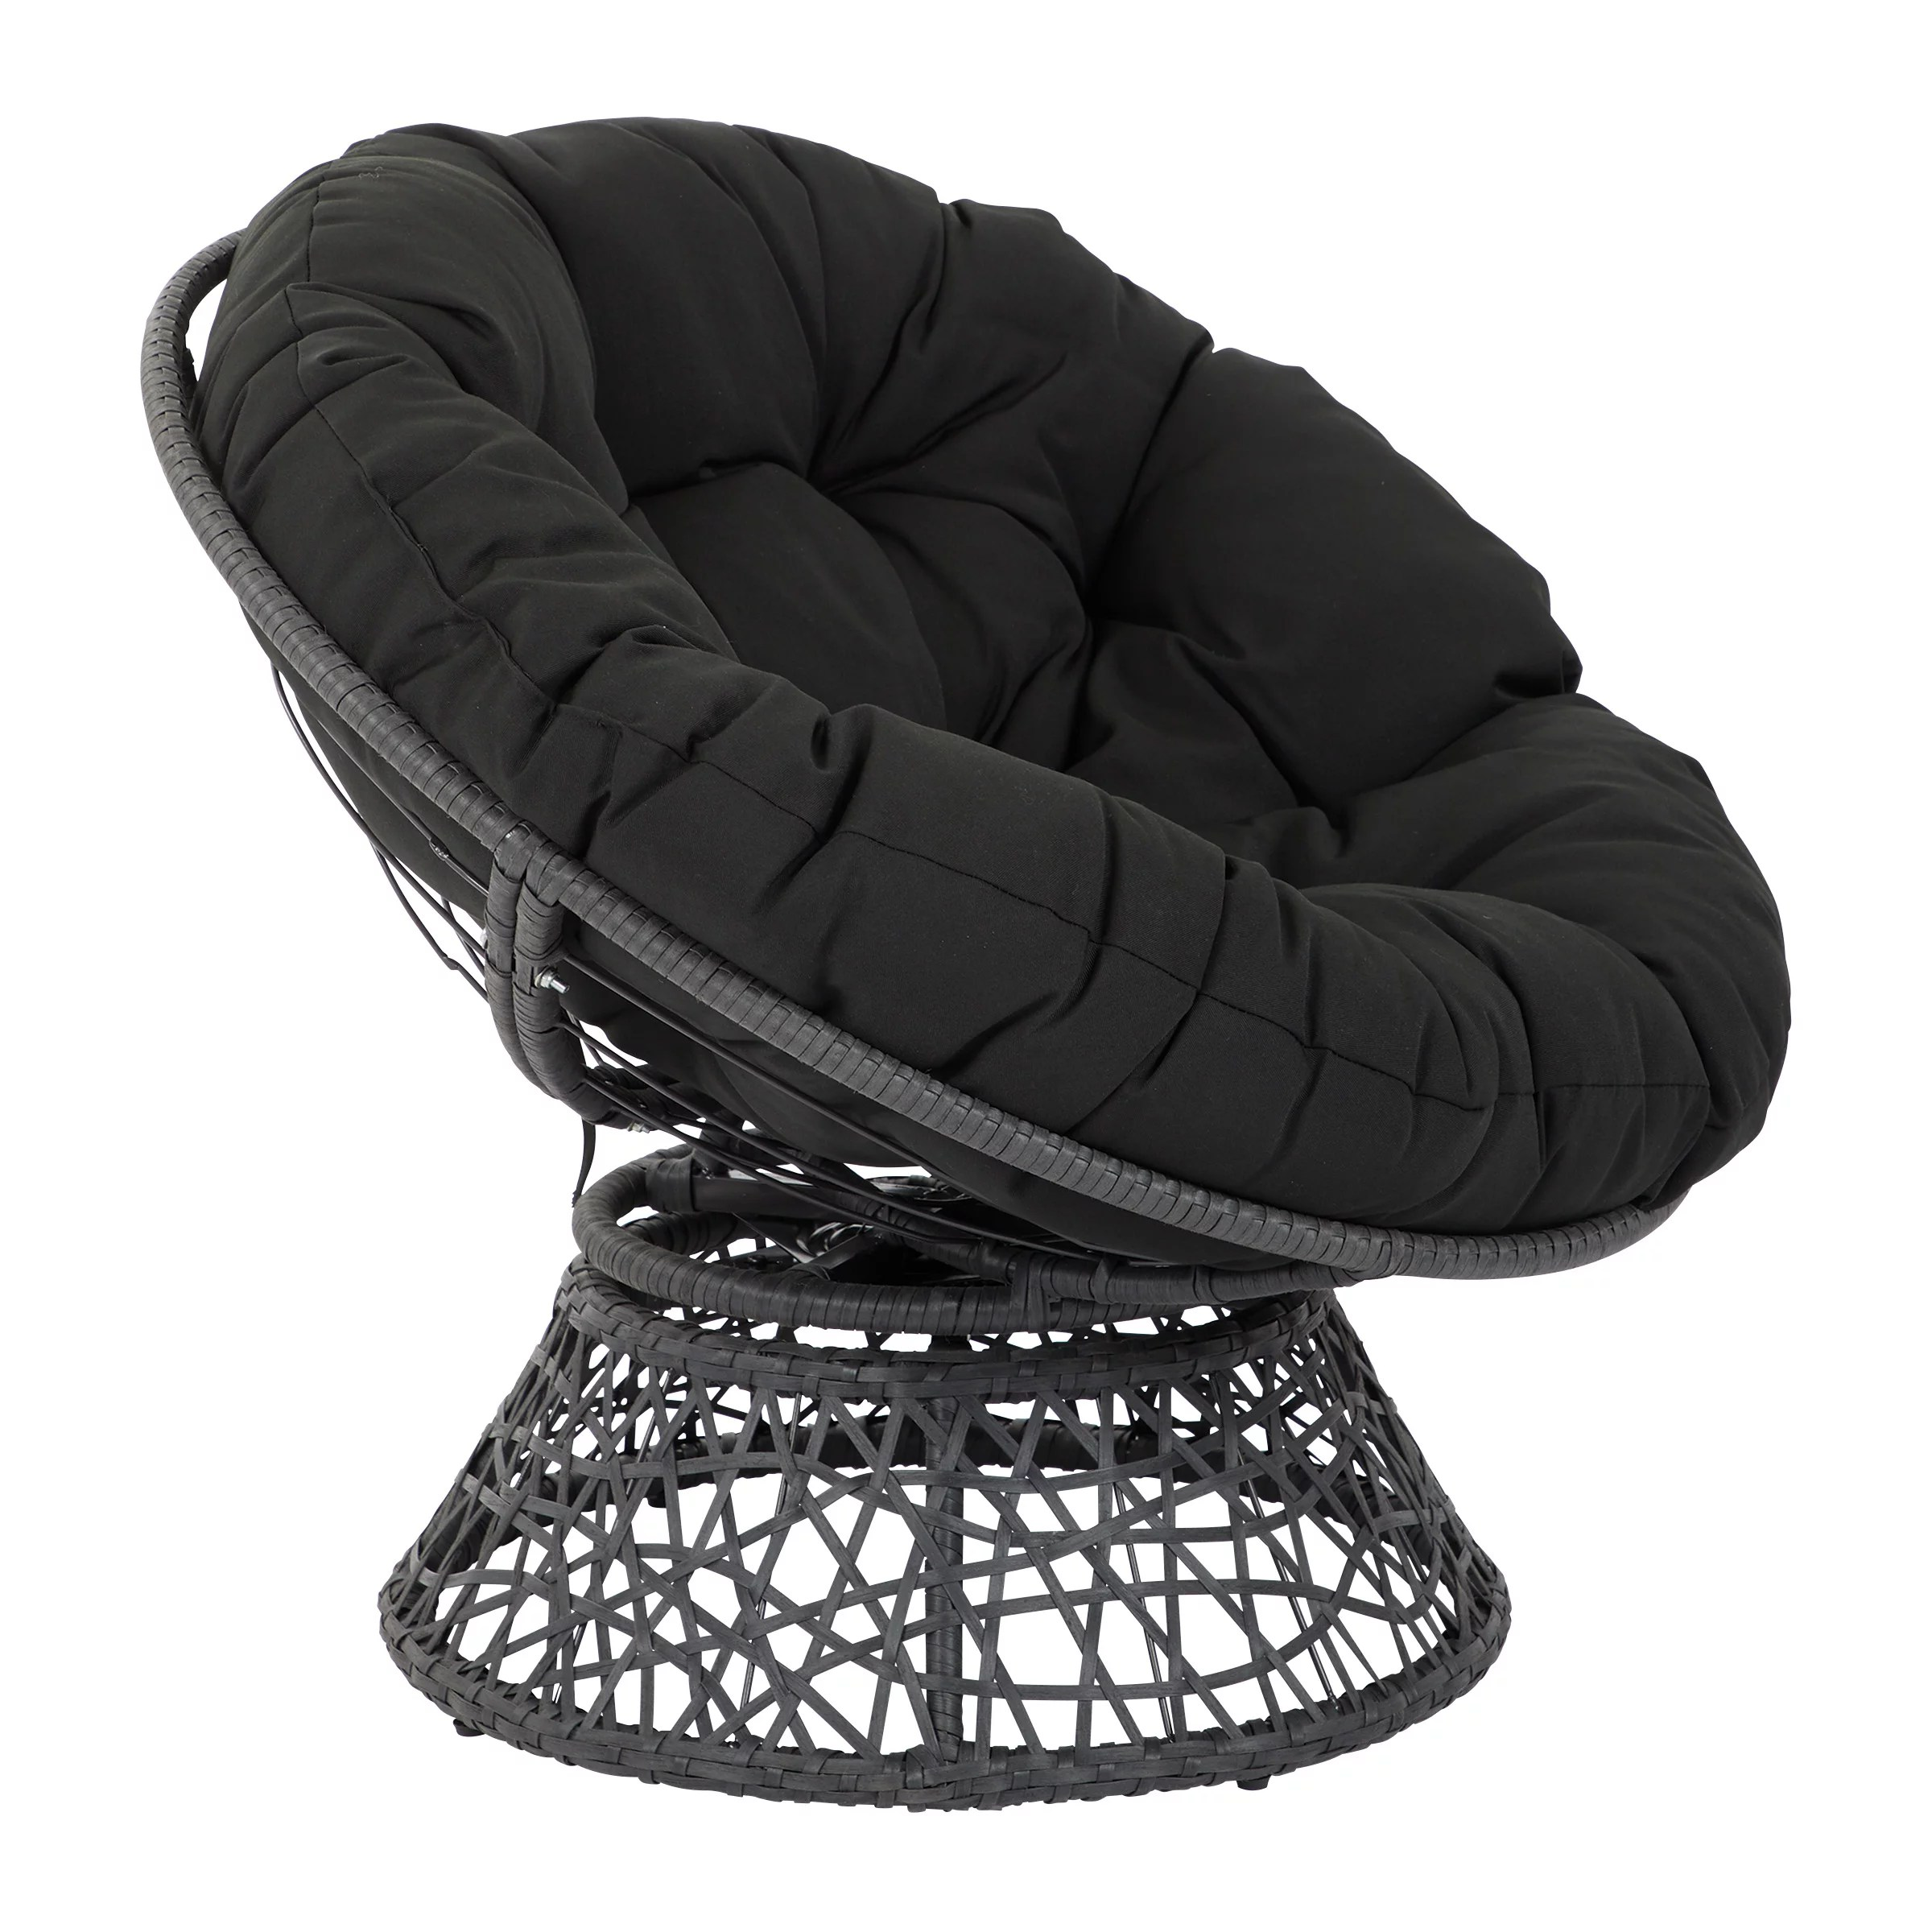 Papasan Chair with Black cushion and Black Frame  Walmartcom